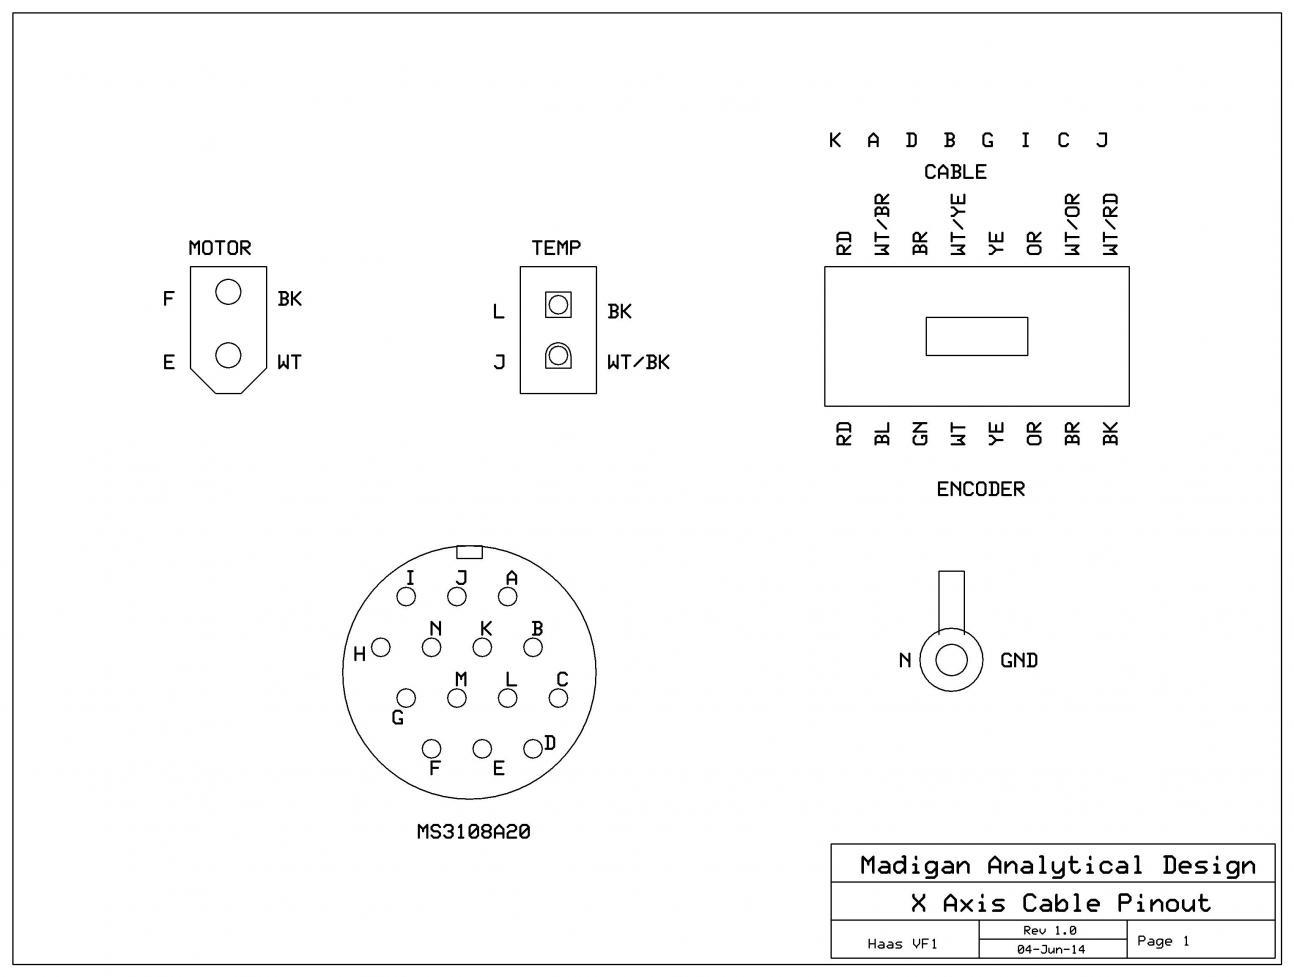 Fanuc Cable Wiring Diagrams - Diagram Ignitor Viking Wiring 0080908000 for Wiring  Diagram SchematicsWiring Diagram Schematics